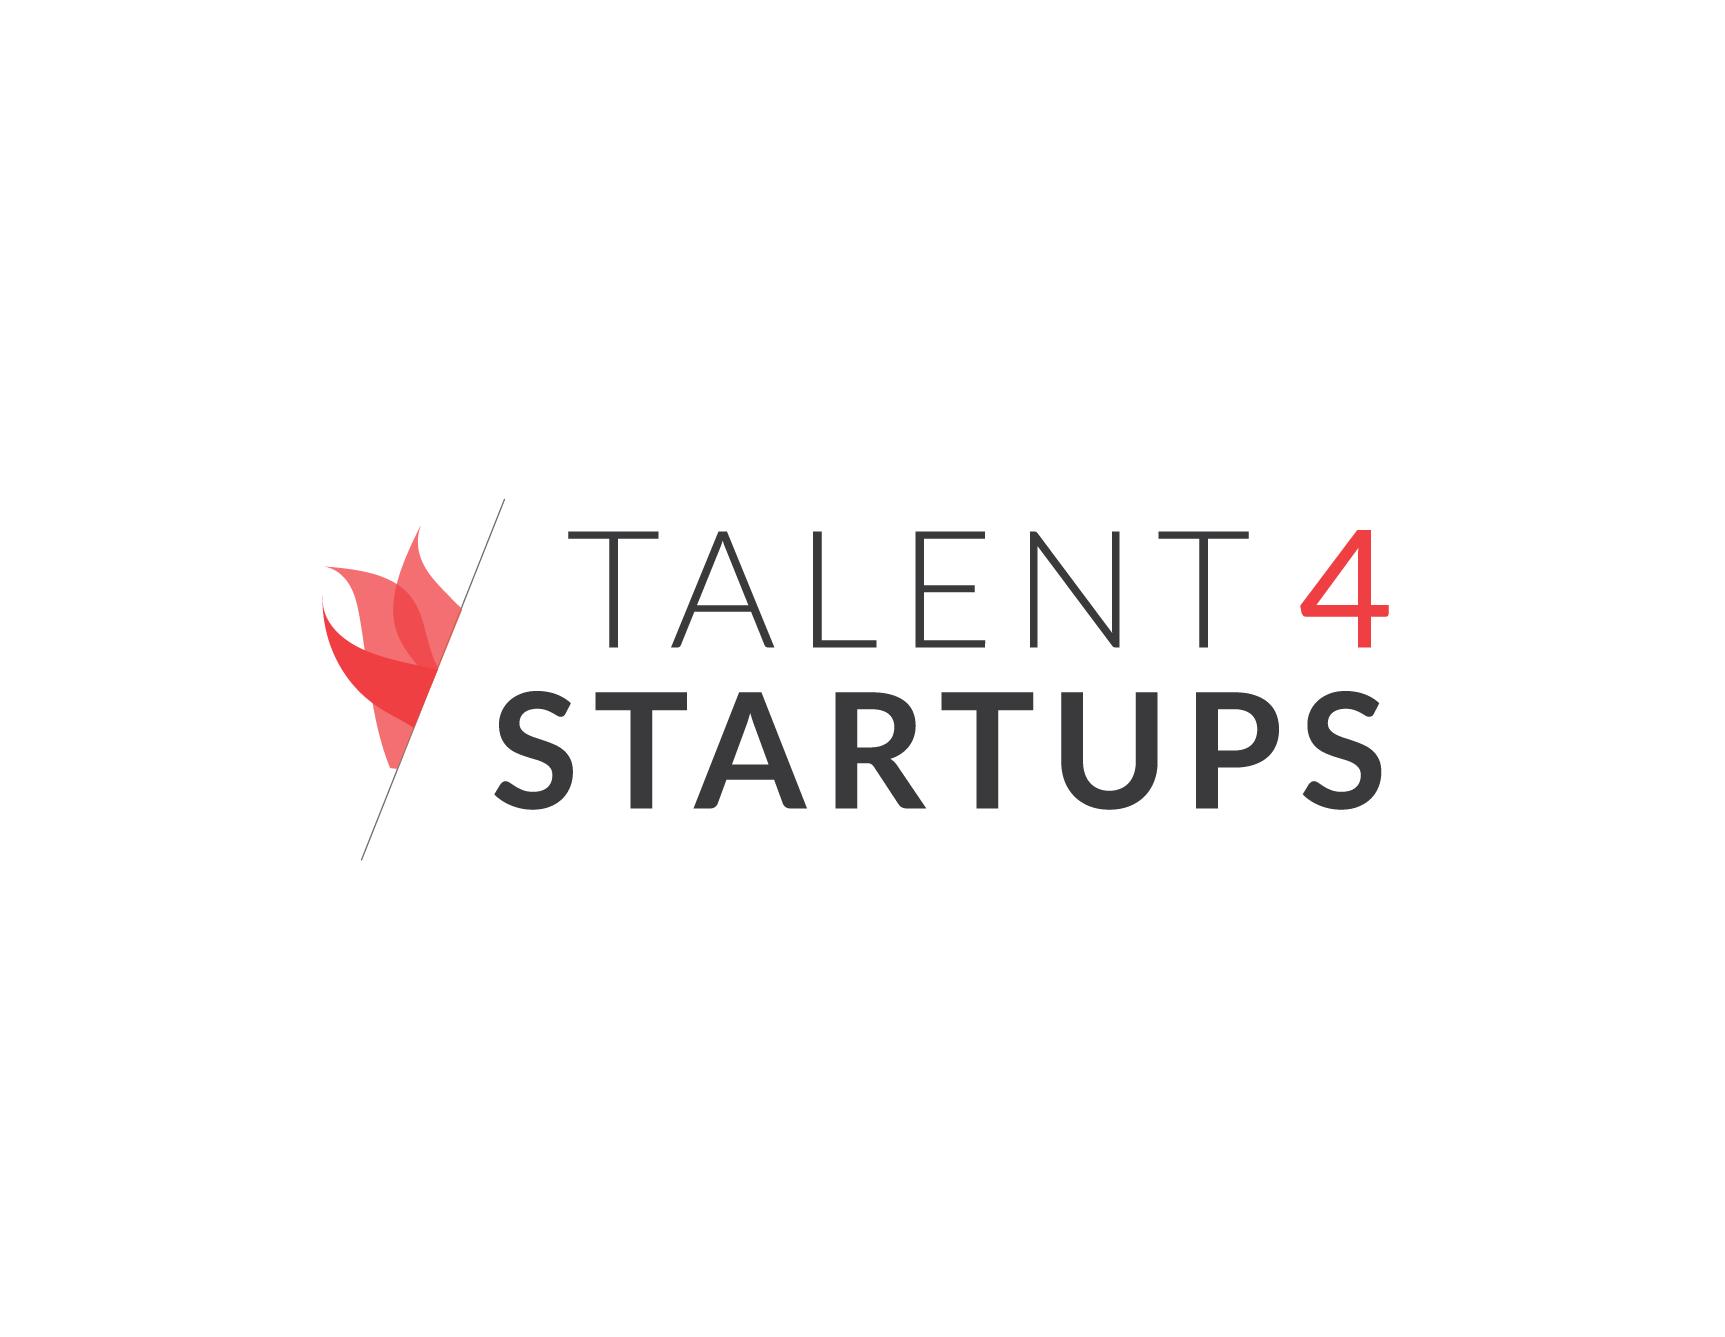 Talent4Startups Big photo.png